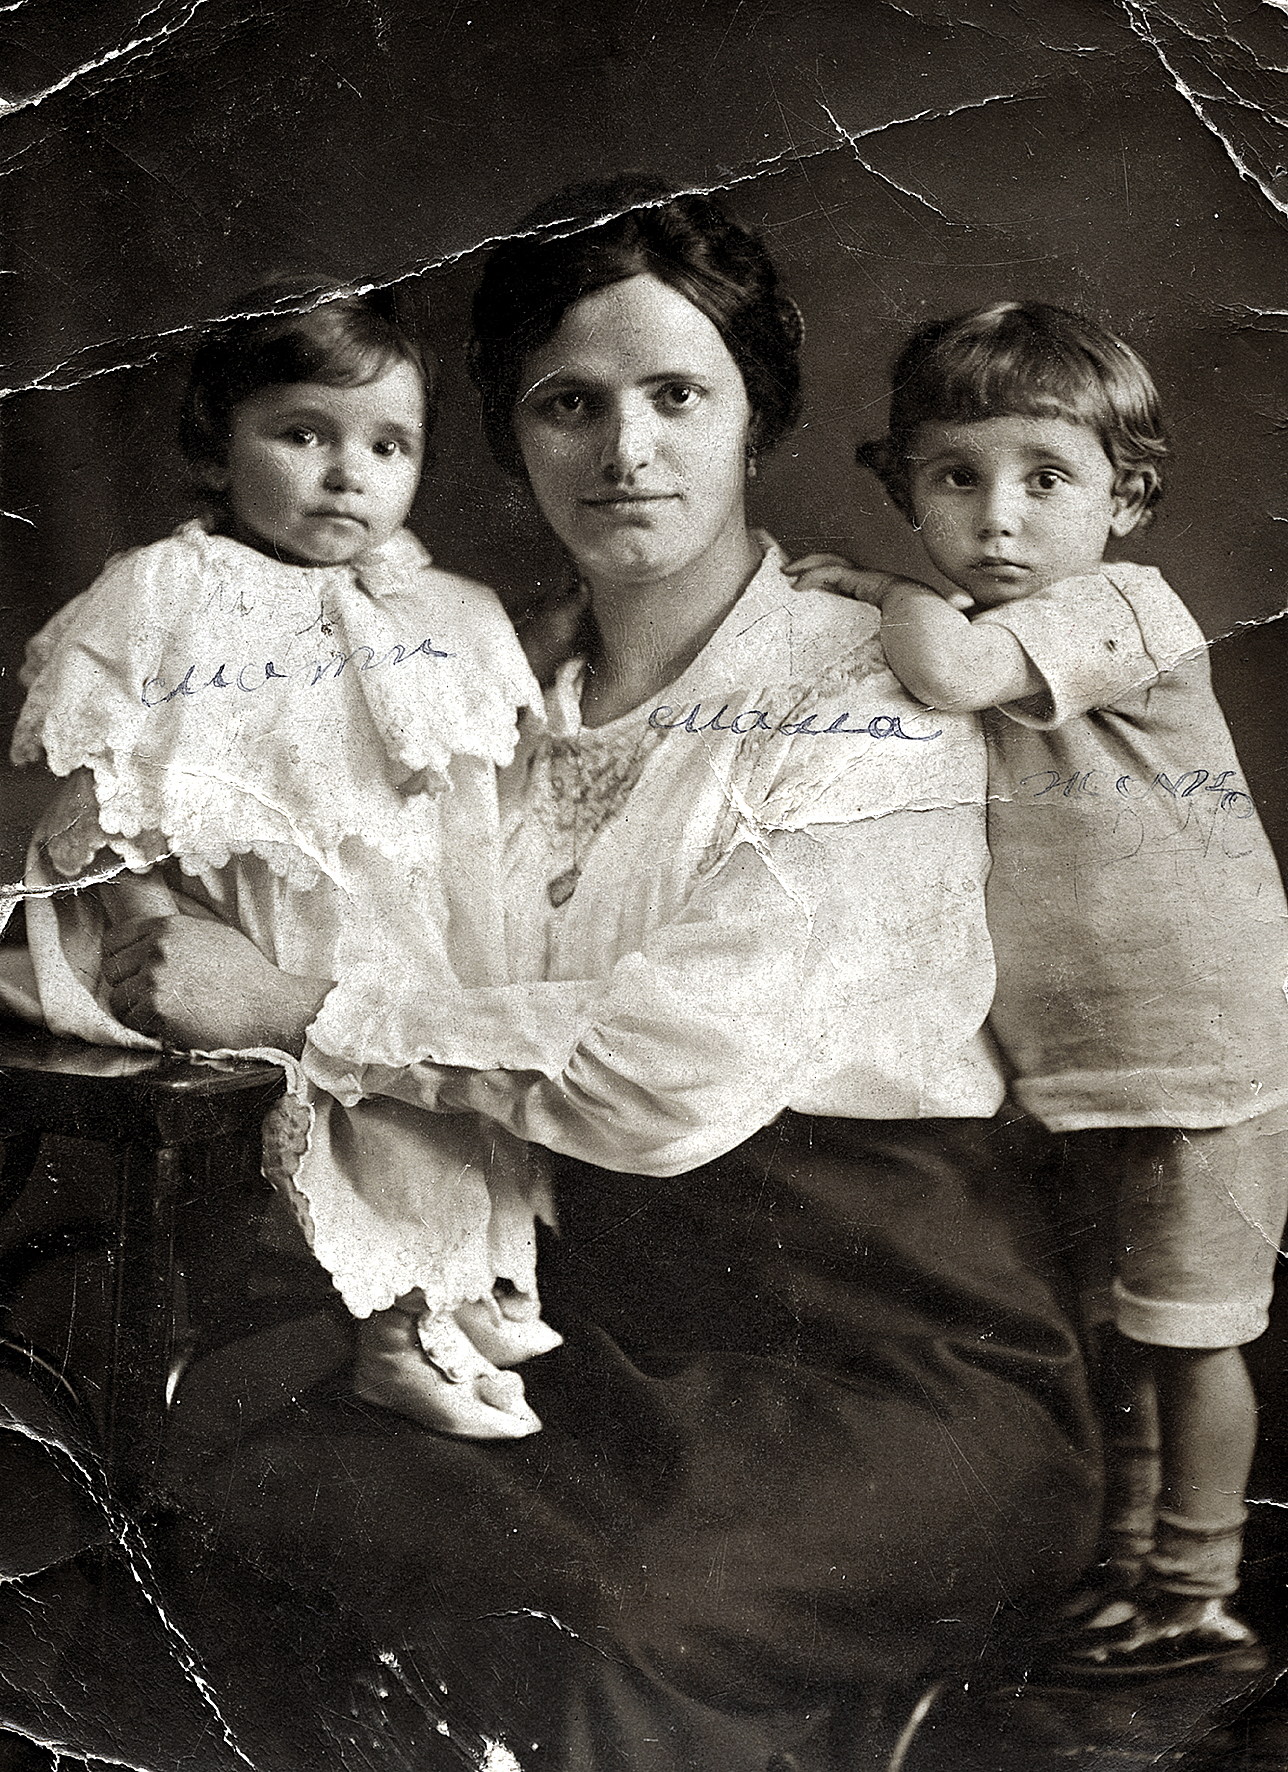 Matilda Albuhaire's mother Rebecca Albuhaire